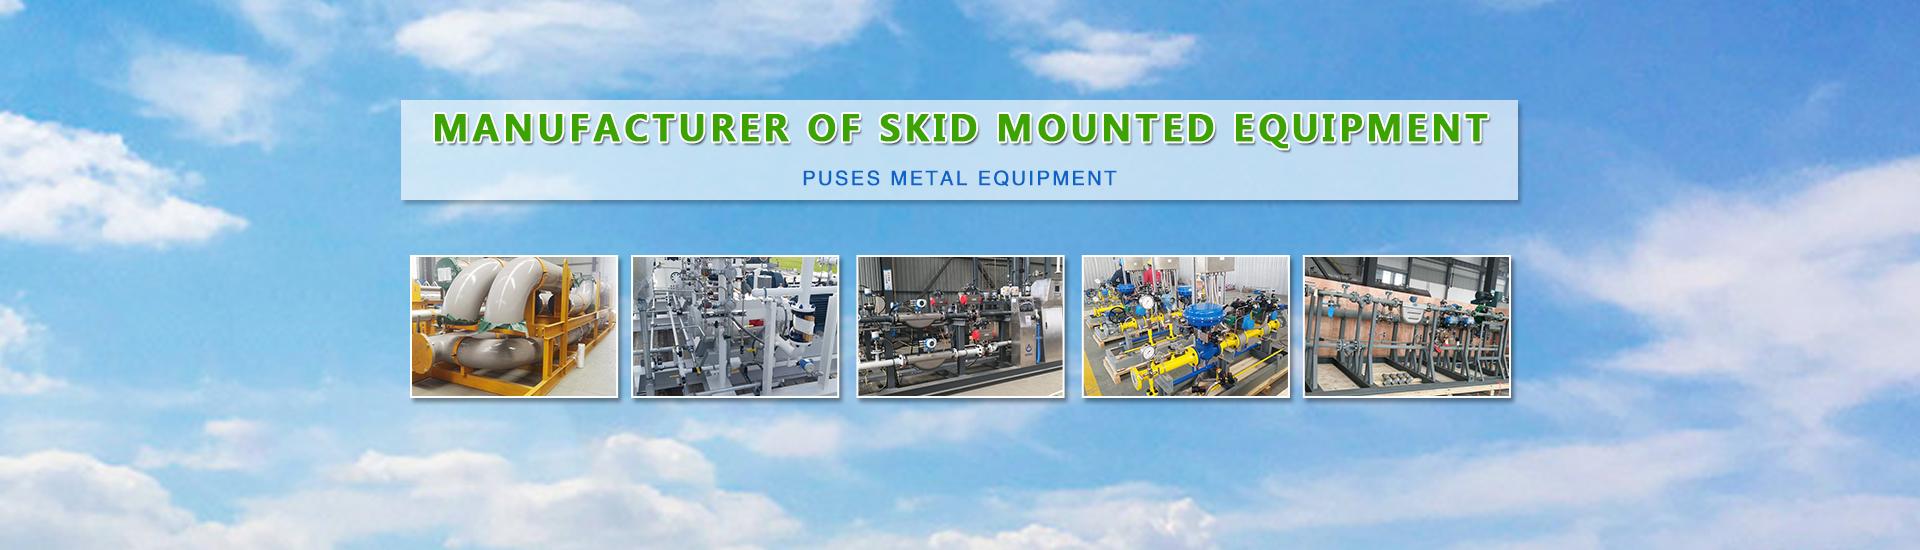 Skid mounted equipment